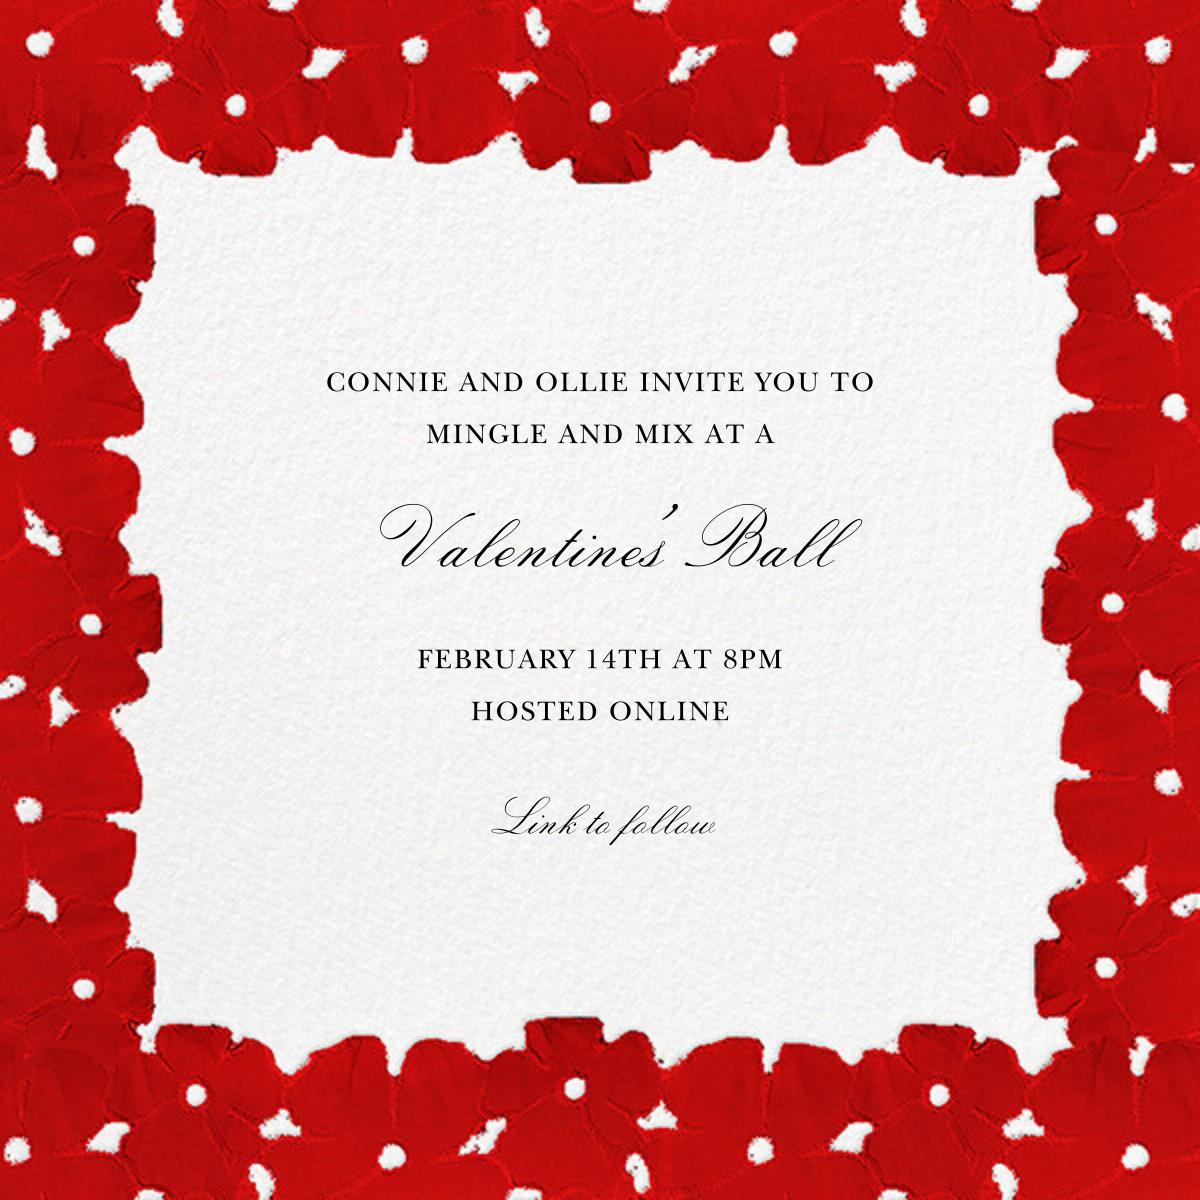 Painted Blooms - Crimson - Oscar de la Renta - Valentine's Day